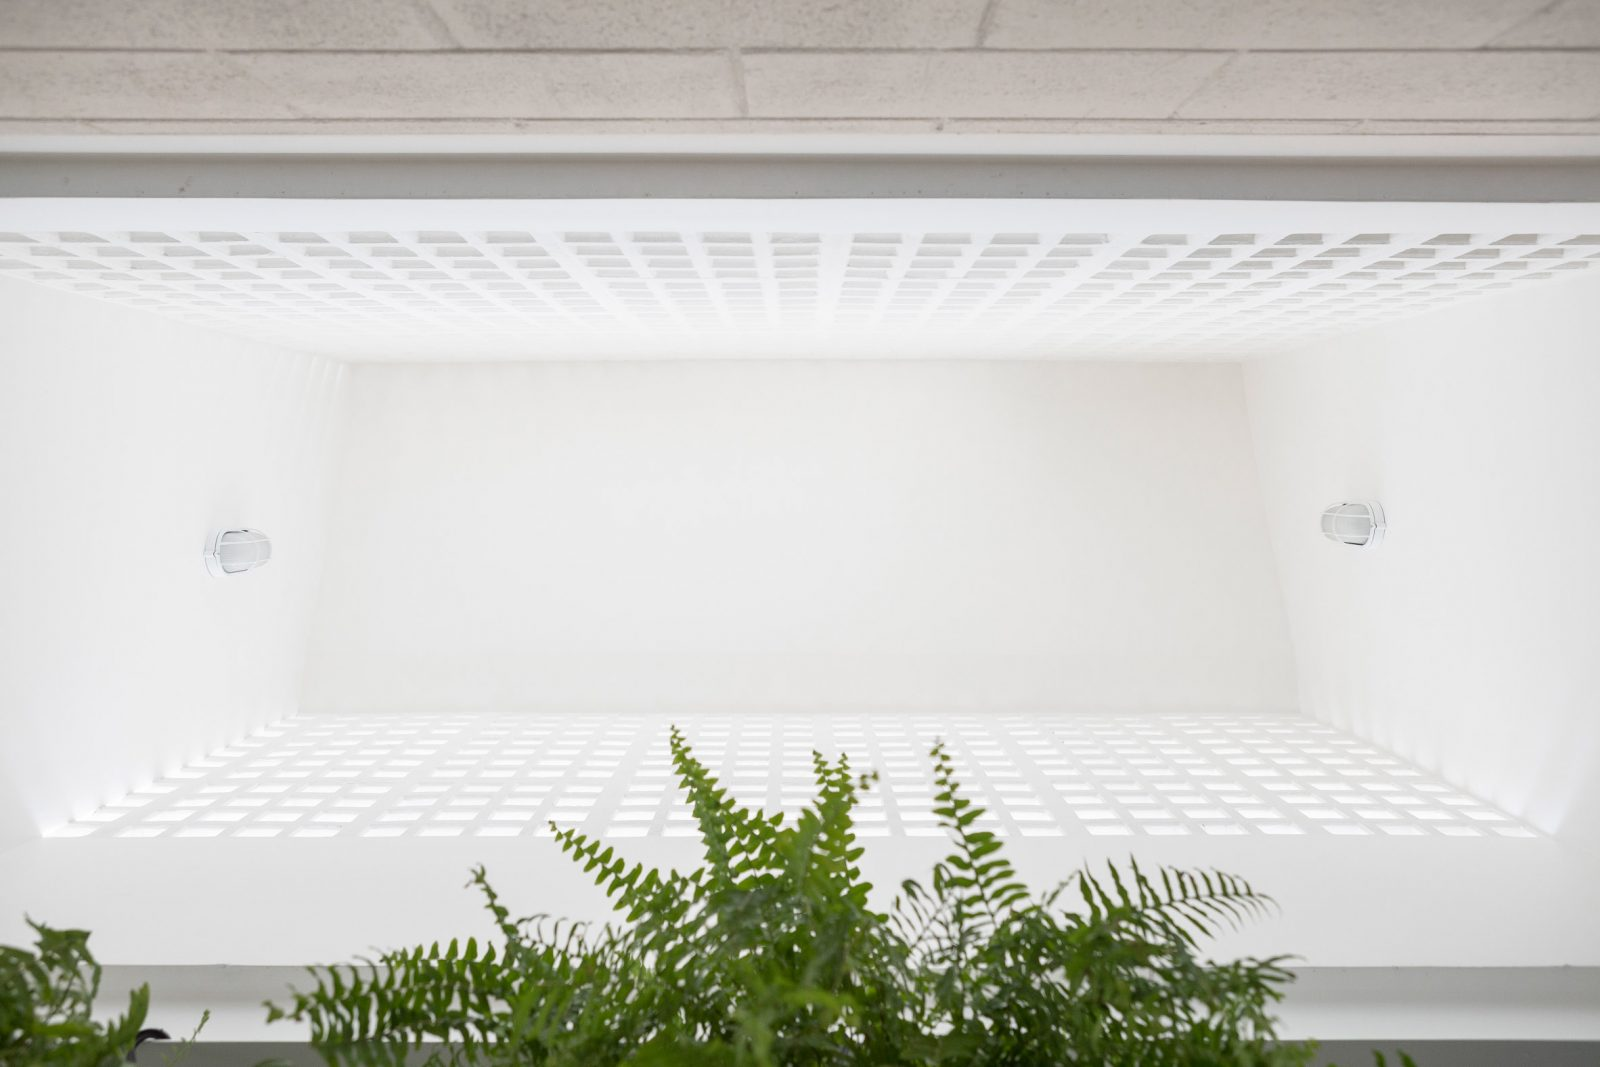 casa-711h-bloco-arquitetos-Joana-Franca-06jpg-1600x1067